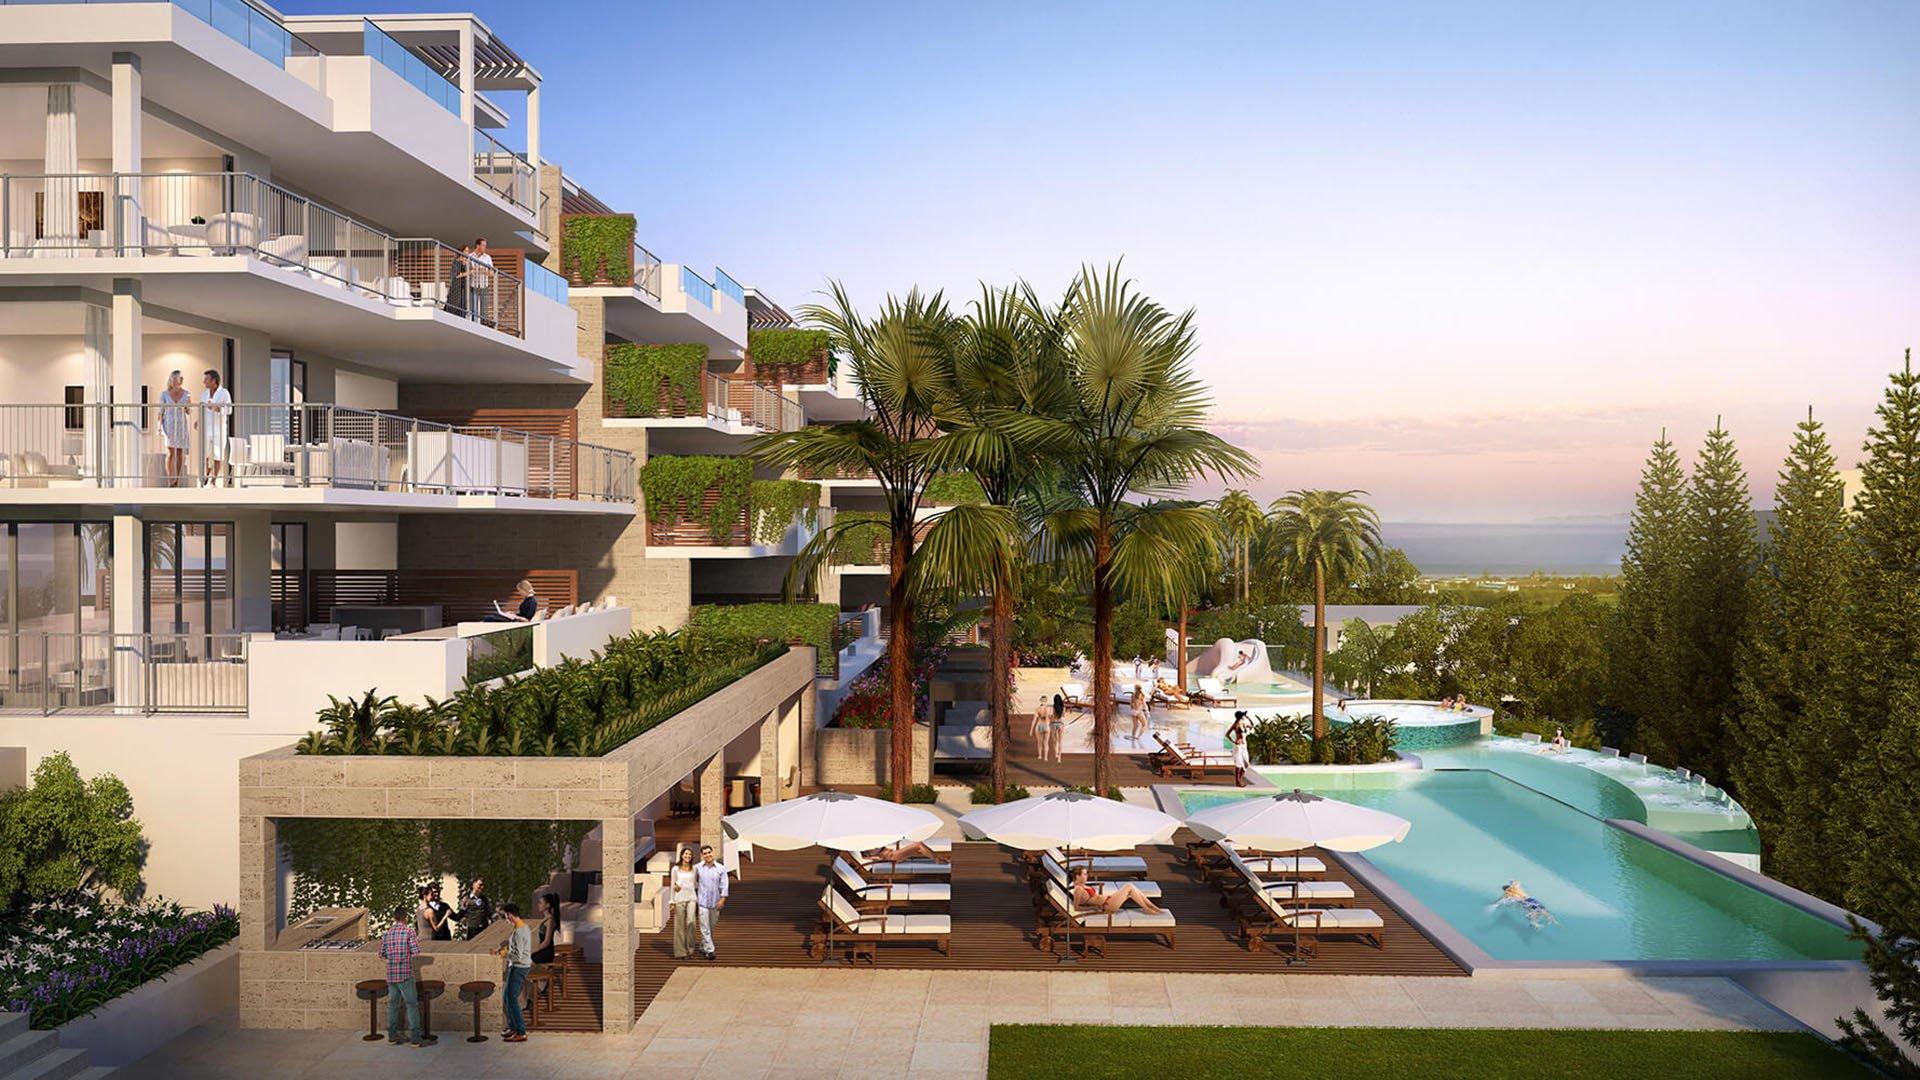 Lotus Jardinana: Modern apartments with resort facilities